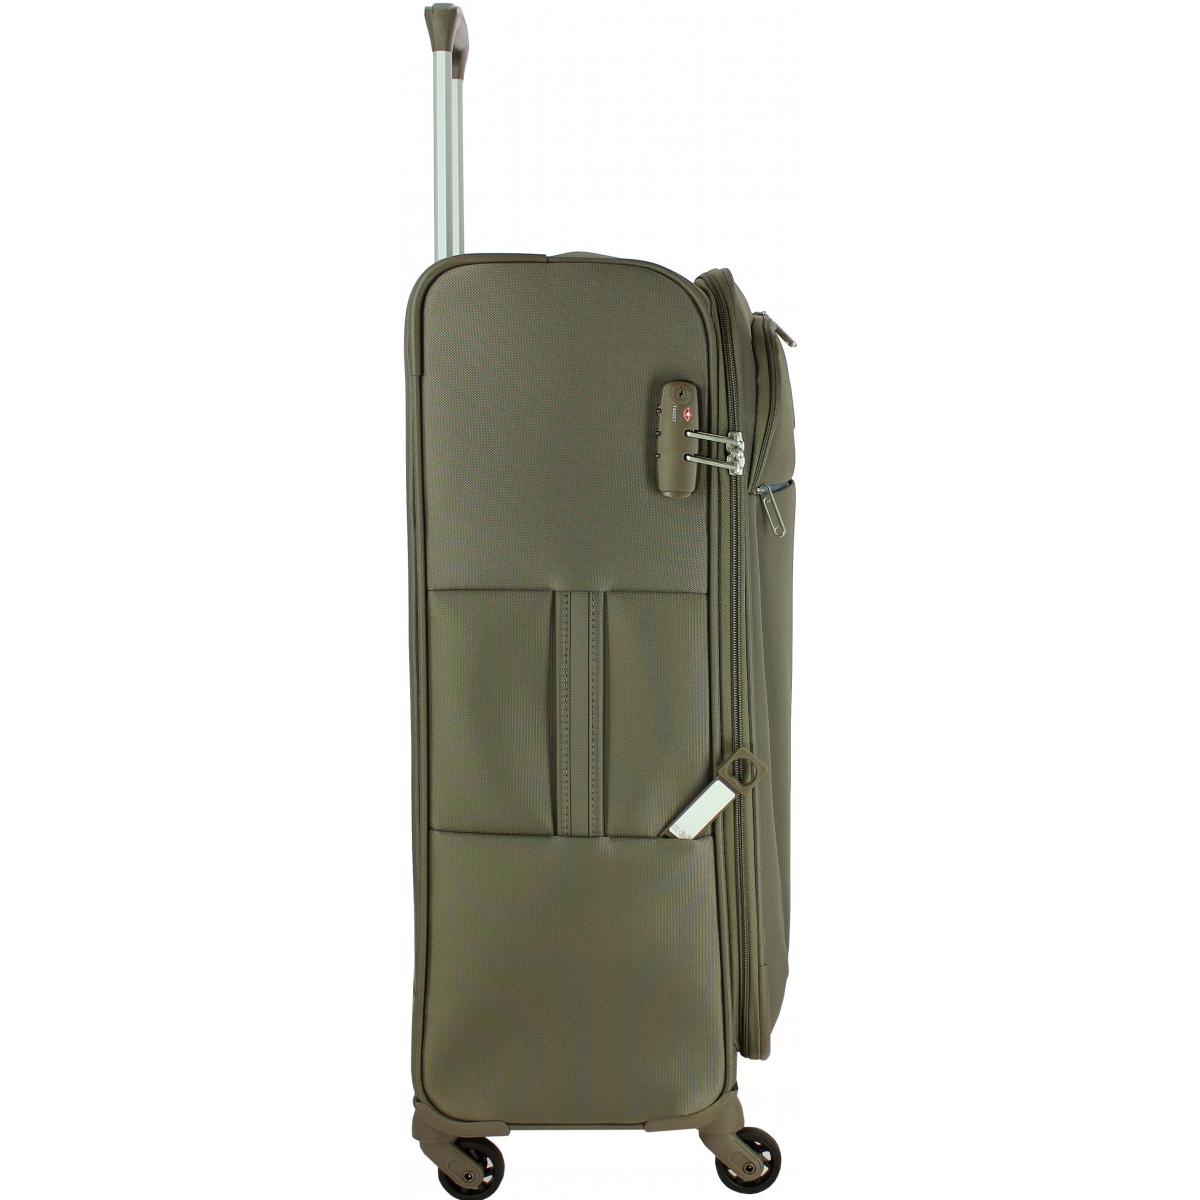 valise souple delsey caleo 68cm caleo811 couleur principale iguane valise pas cher. Black Bedroom Furniture Sets. Home Design Ideas